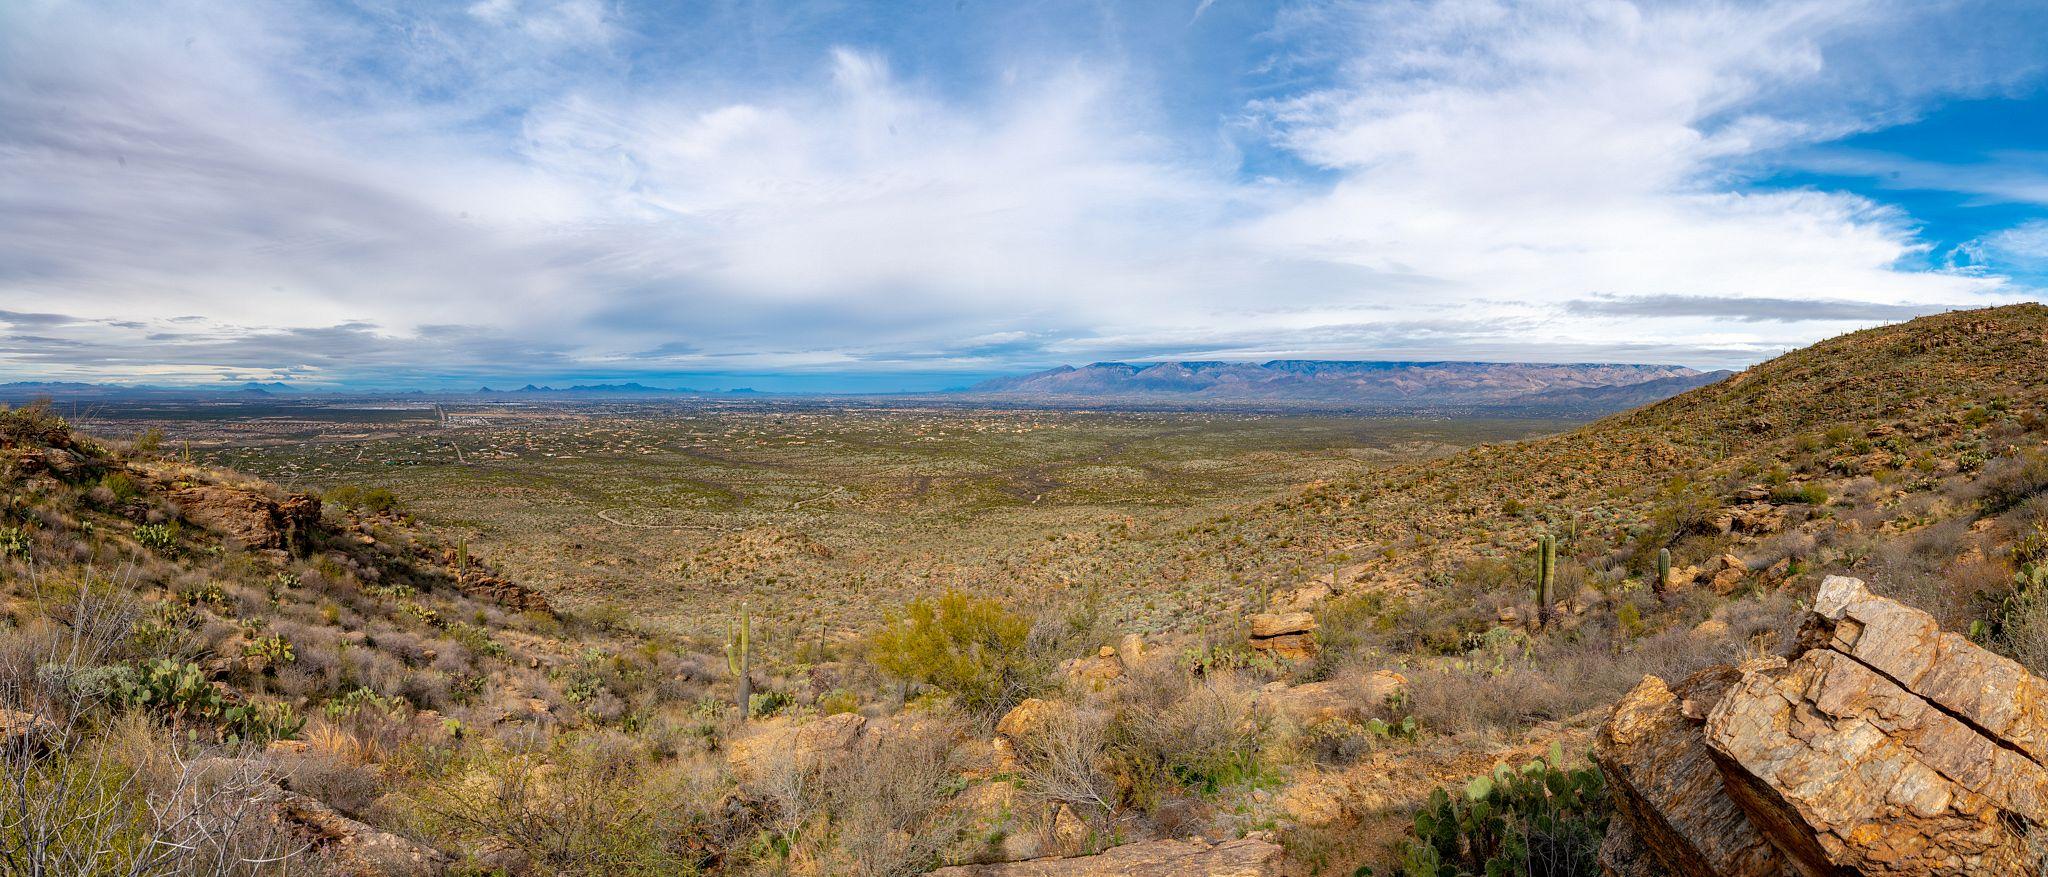 Panoramic Views from Tanque Verde Ridge